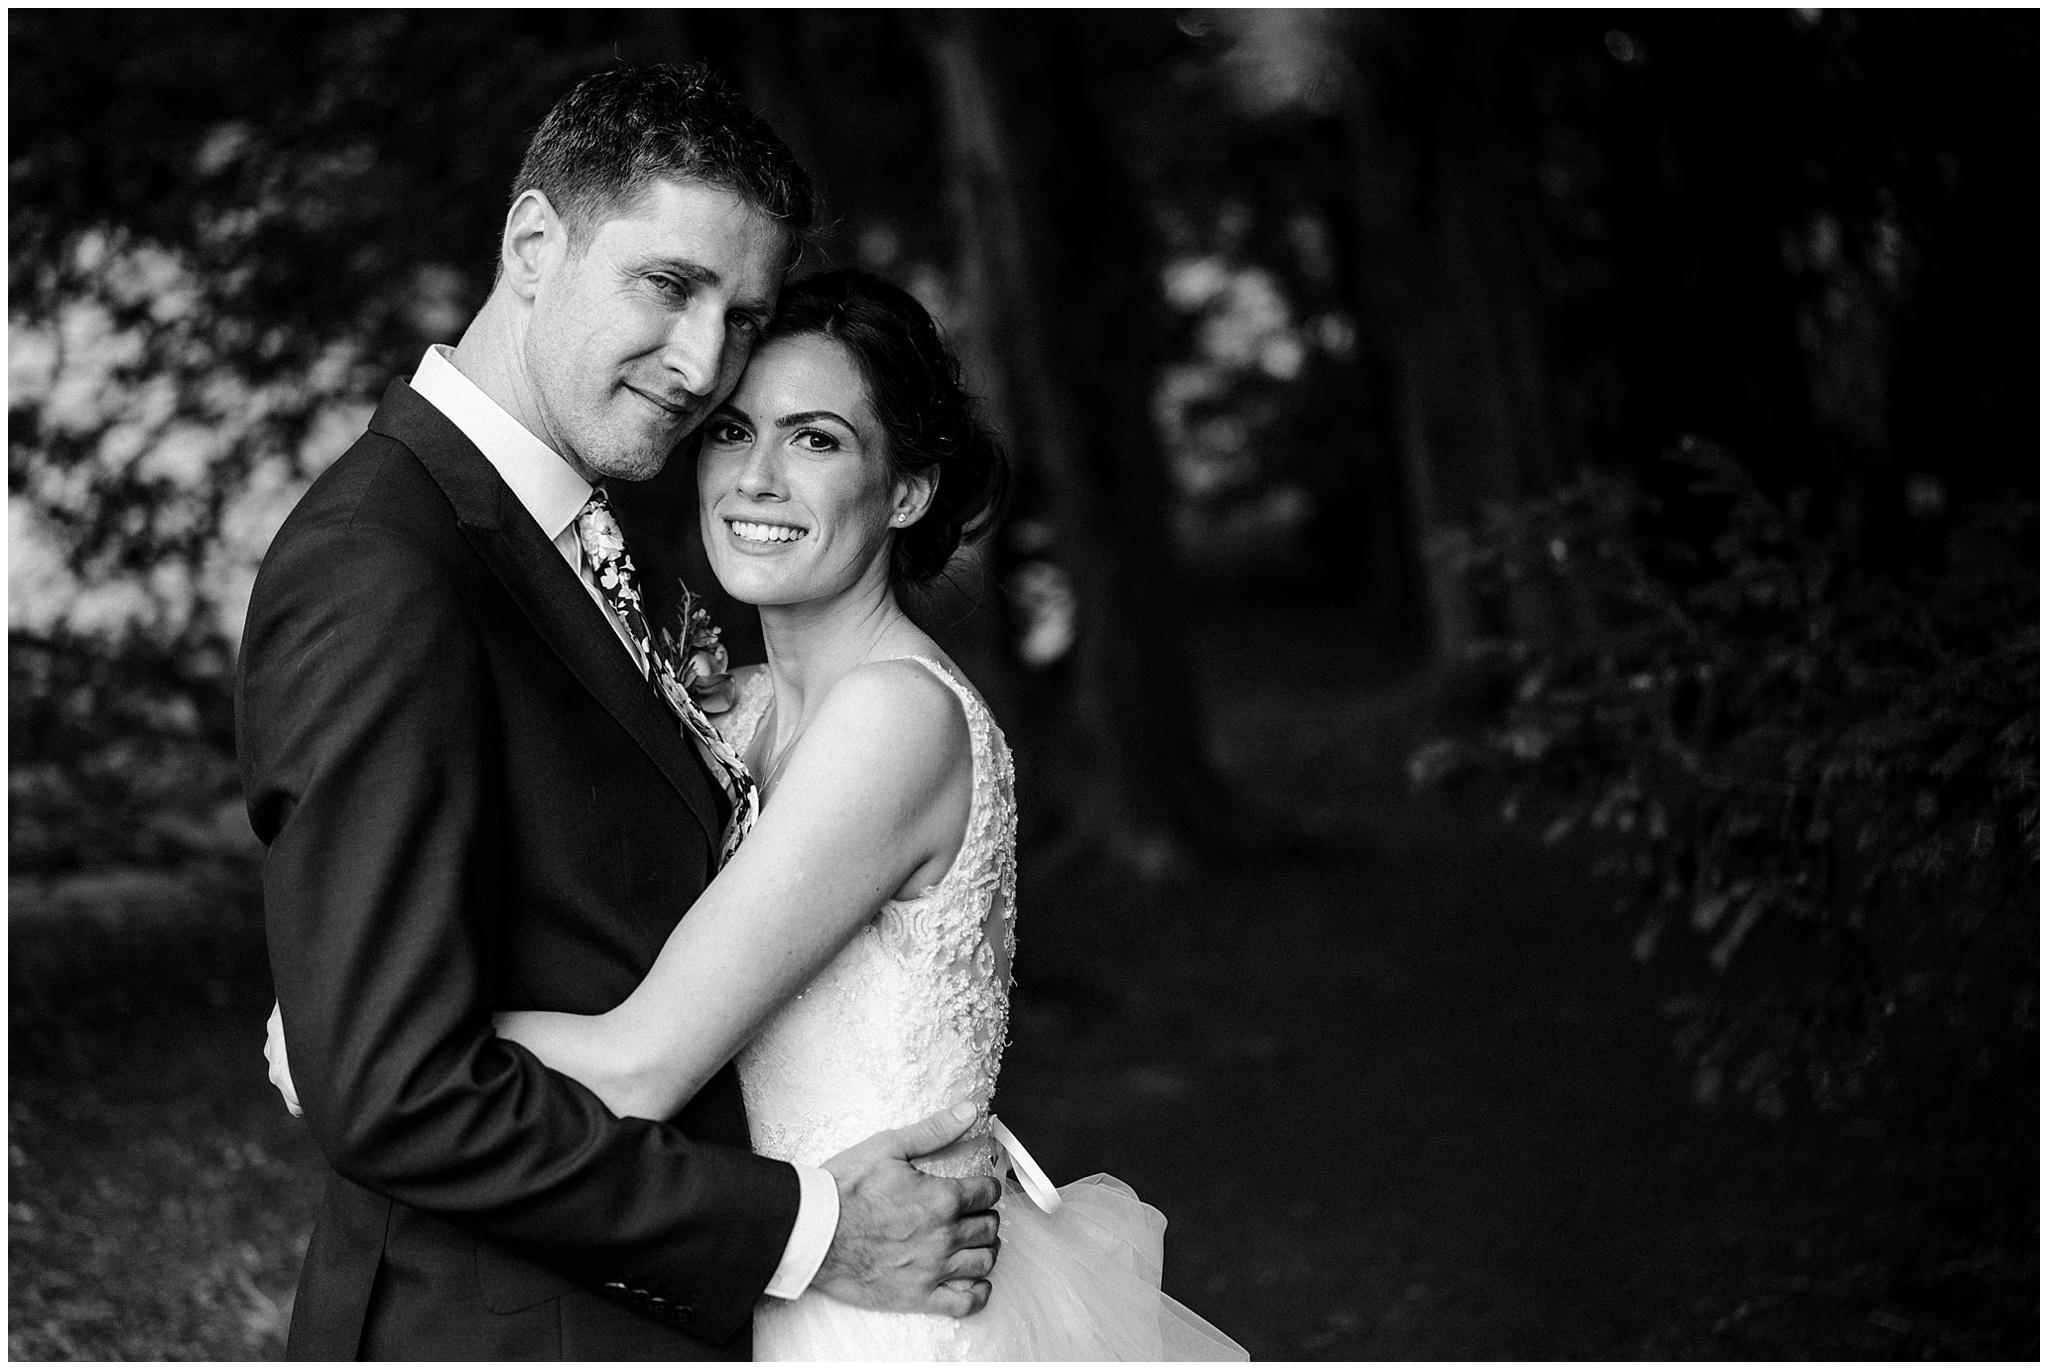 Uk wedding photographer mentoring